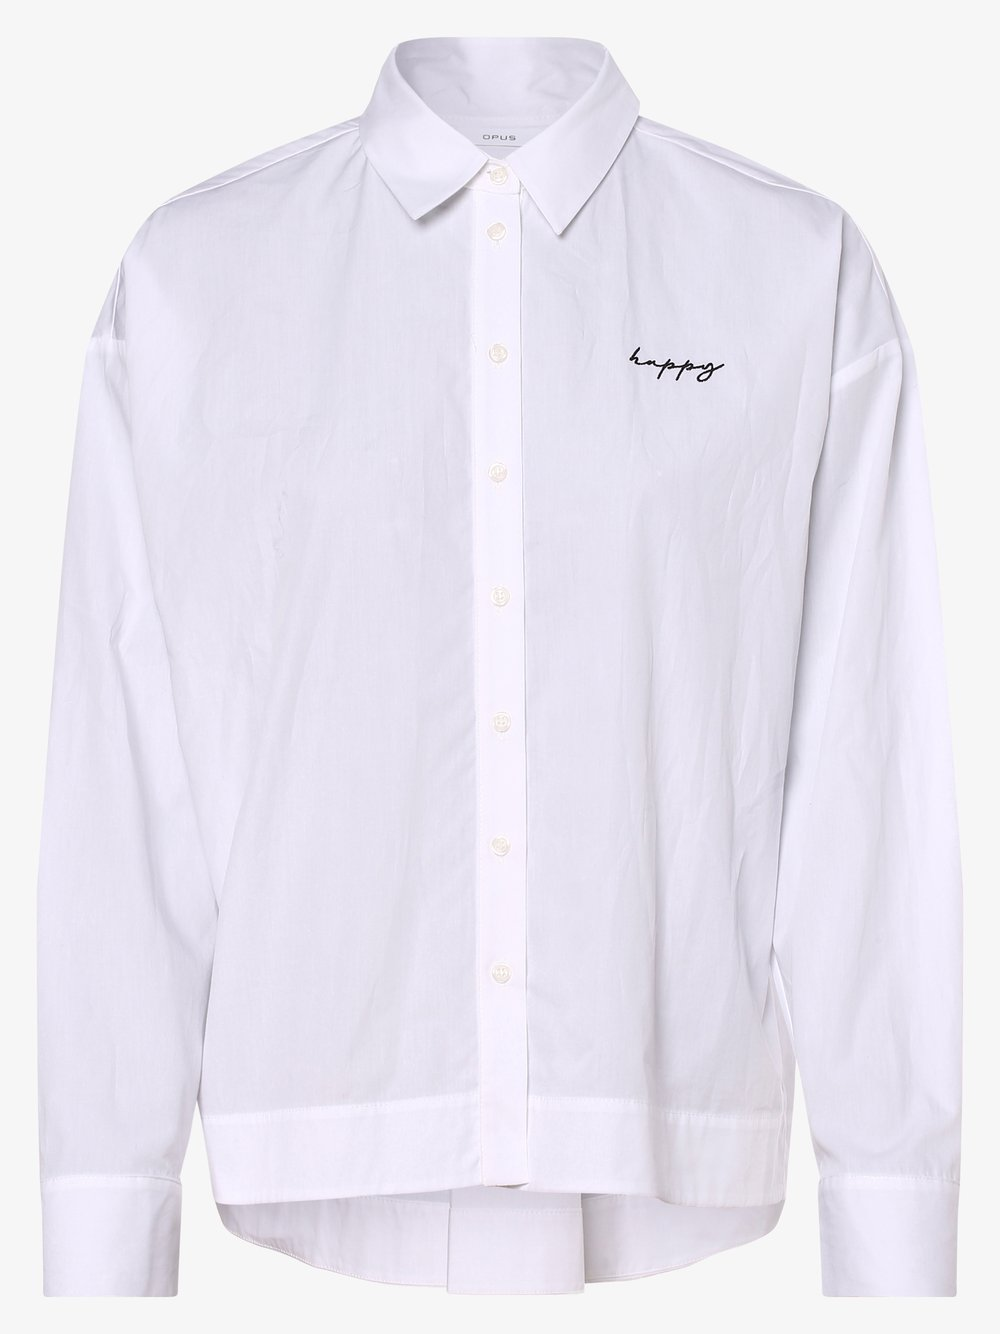 Opus – Bluzka damska – Flarine, biały Van Graaf 470730-0001-00380